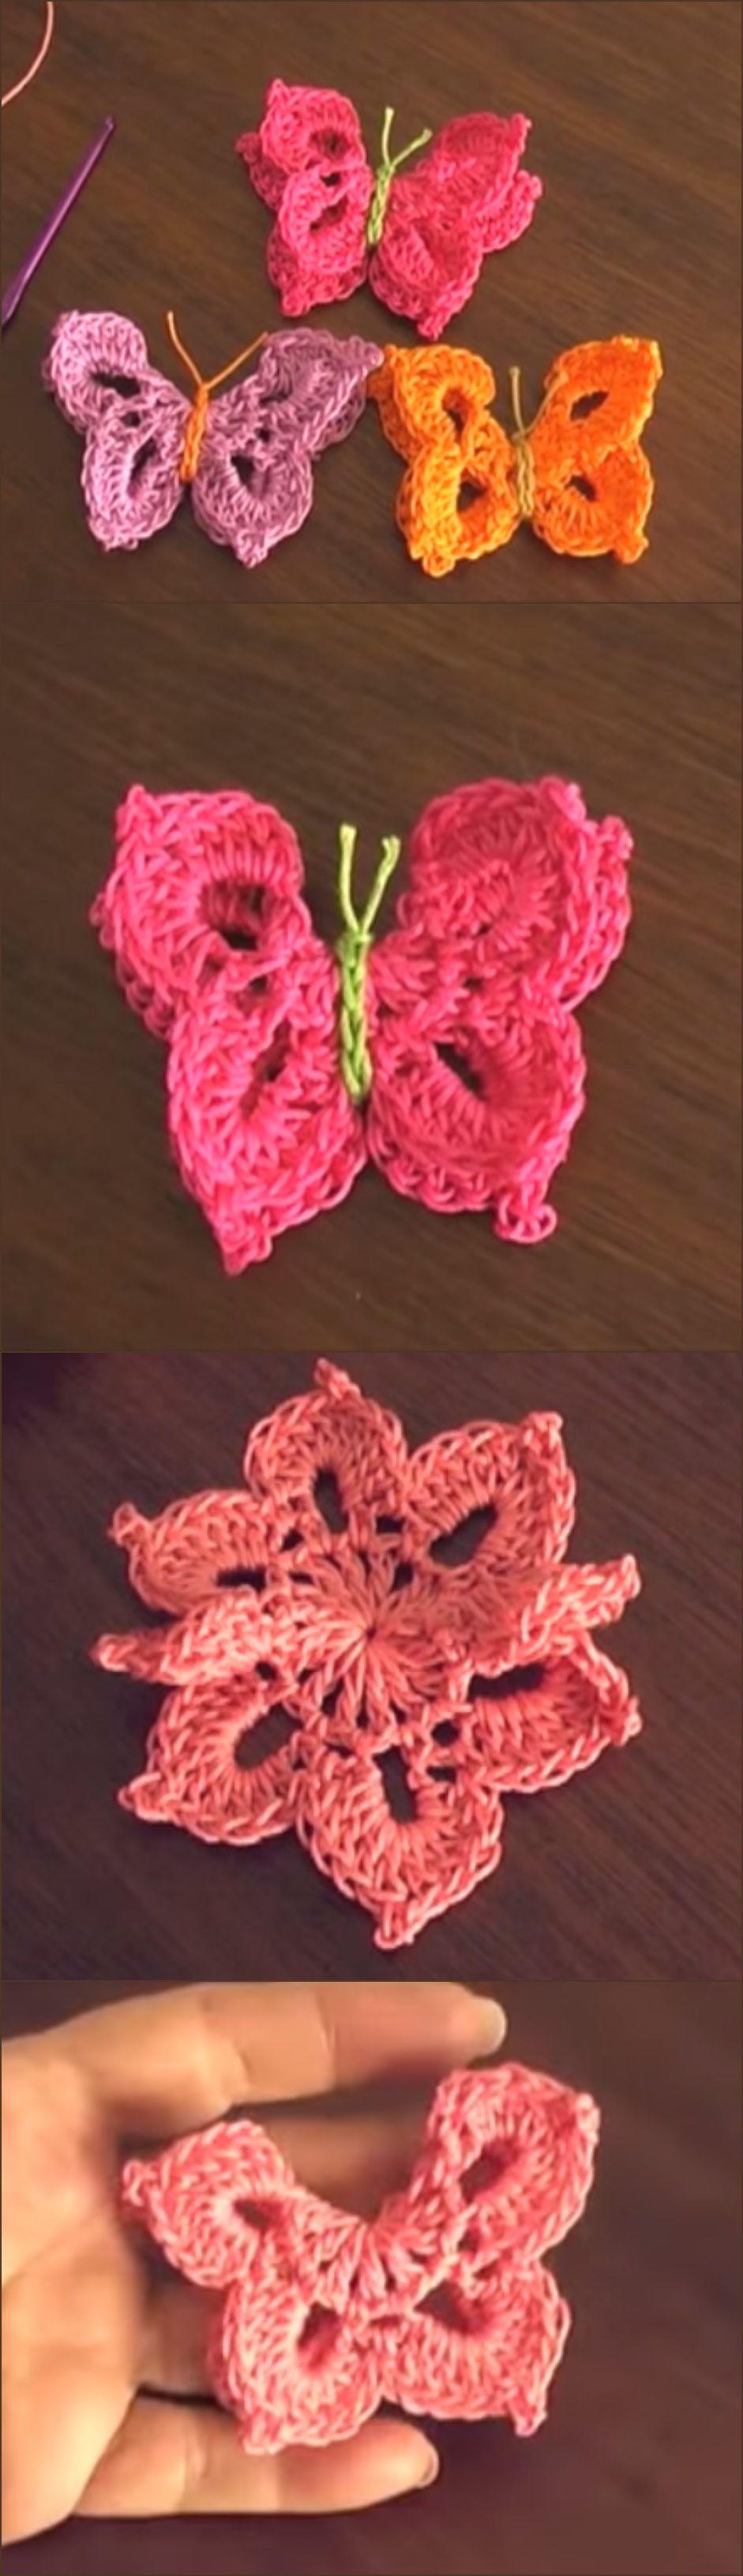 Crochet Butterfly | crochet | Pinterest | Mariposa de croché ...